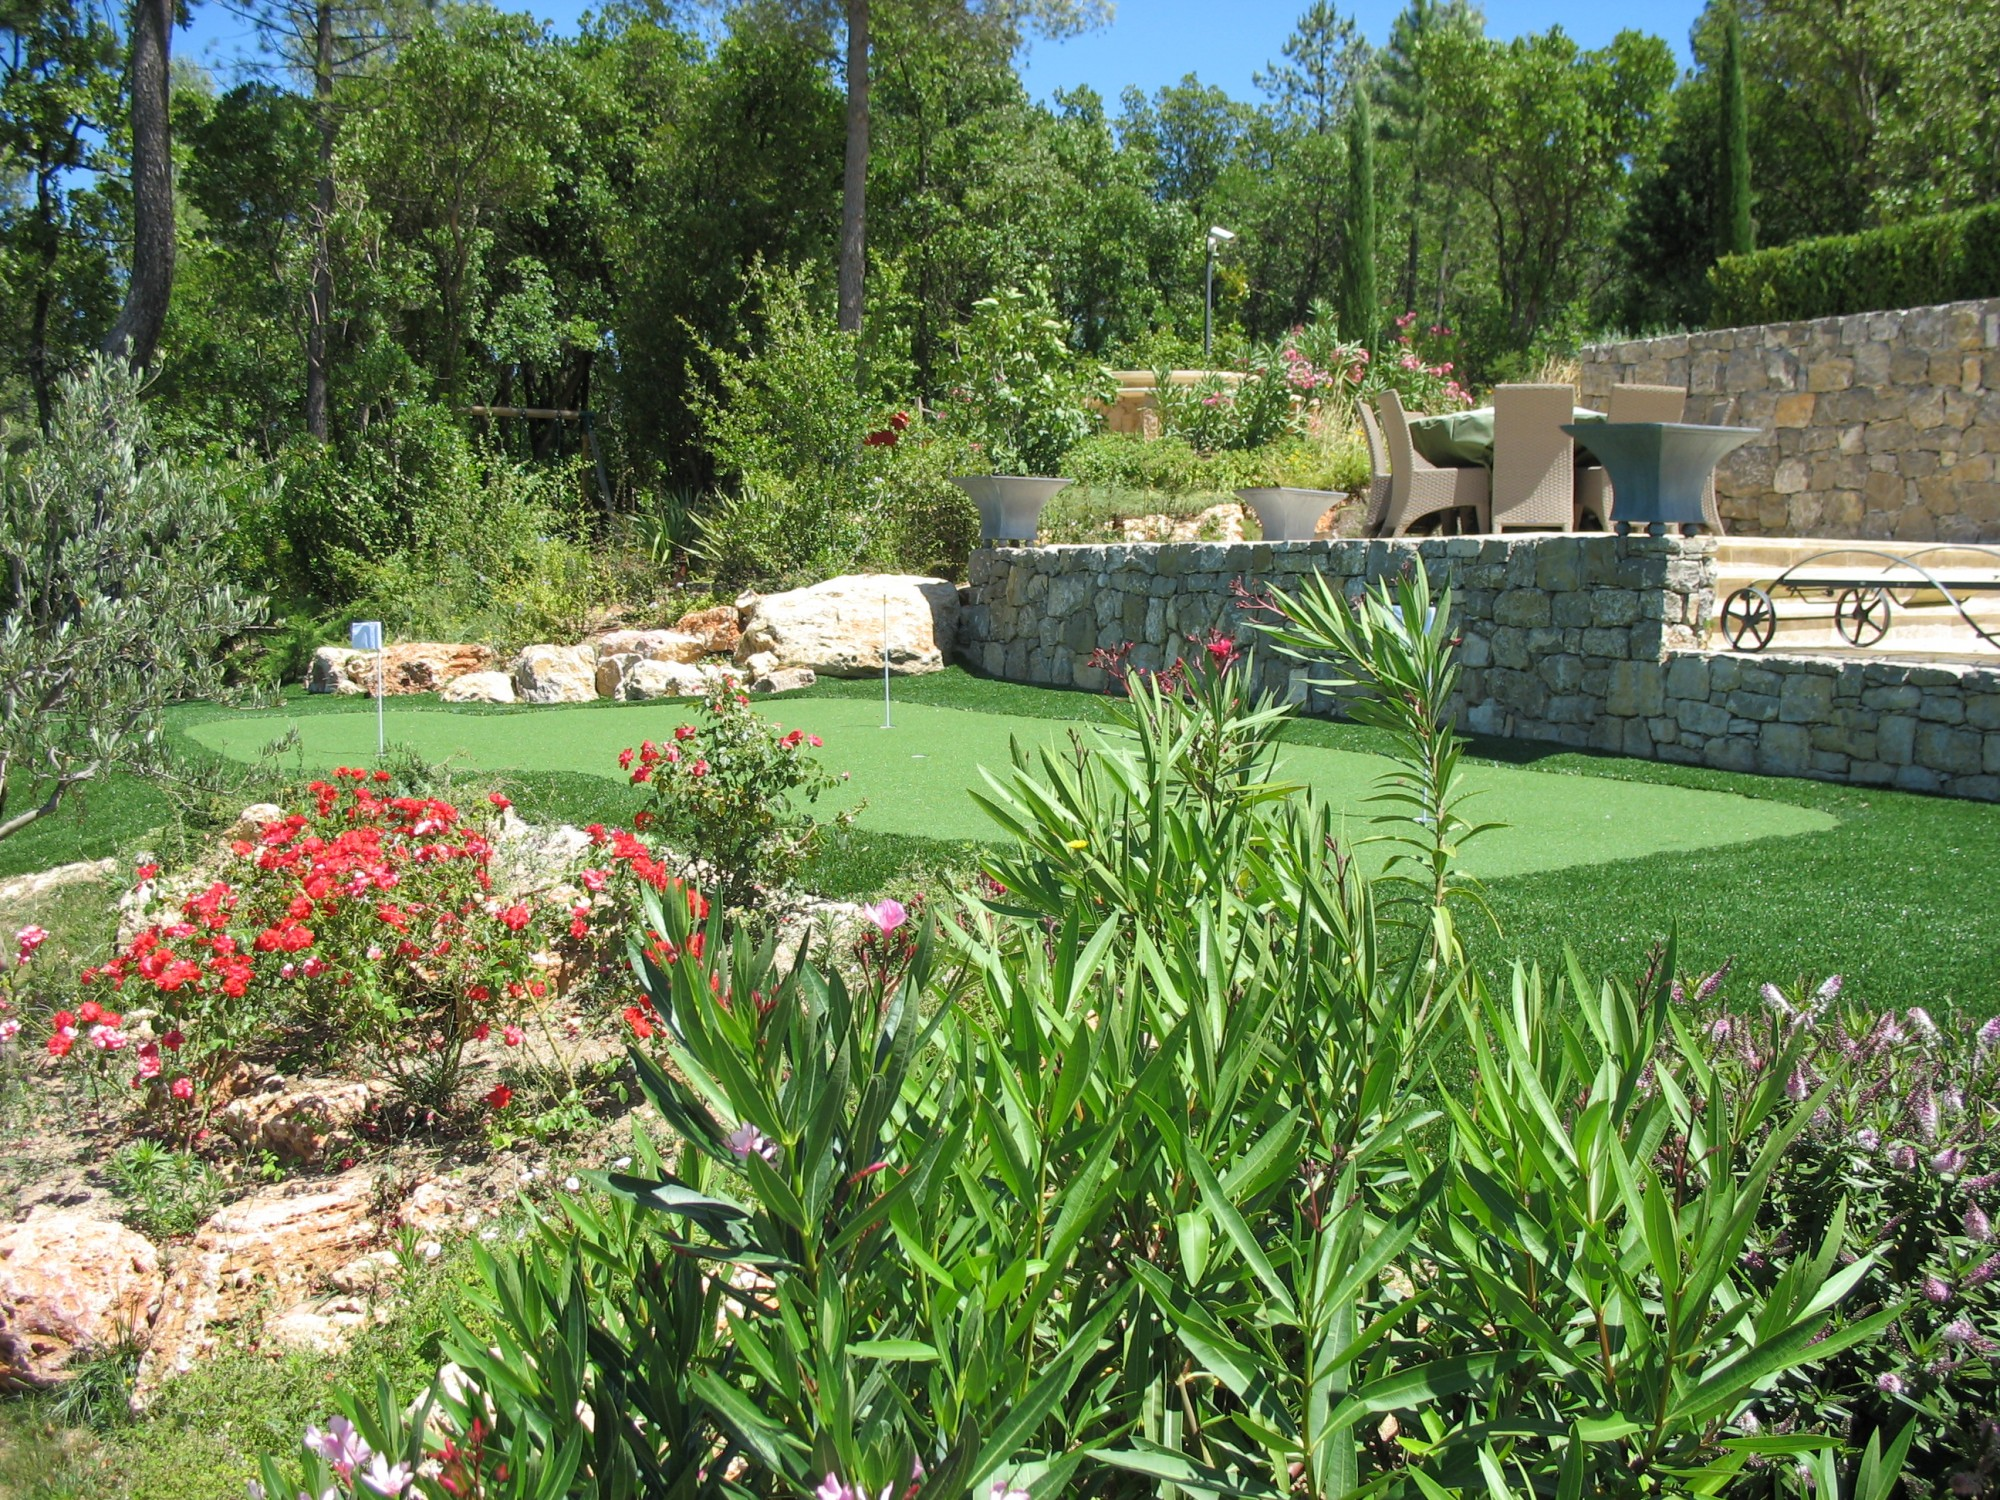 pose pelouse synthtique sur terre with pose pelouse. Black Bedroom Furniture Sets. Home Design Ideas